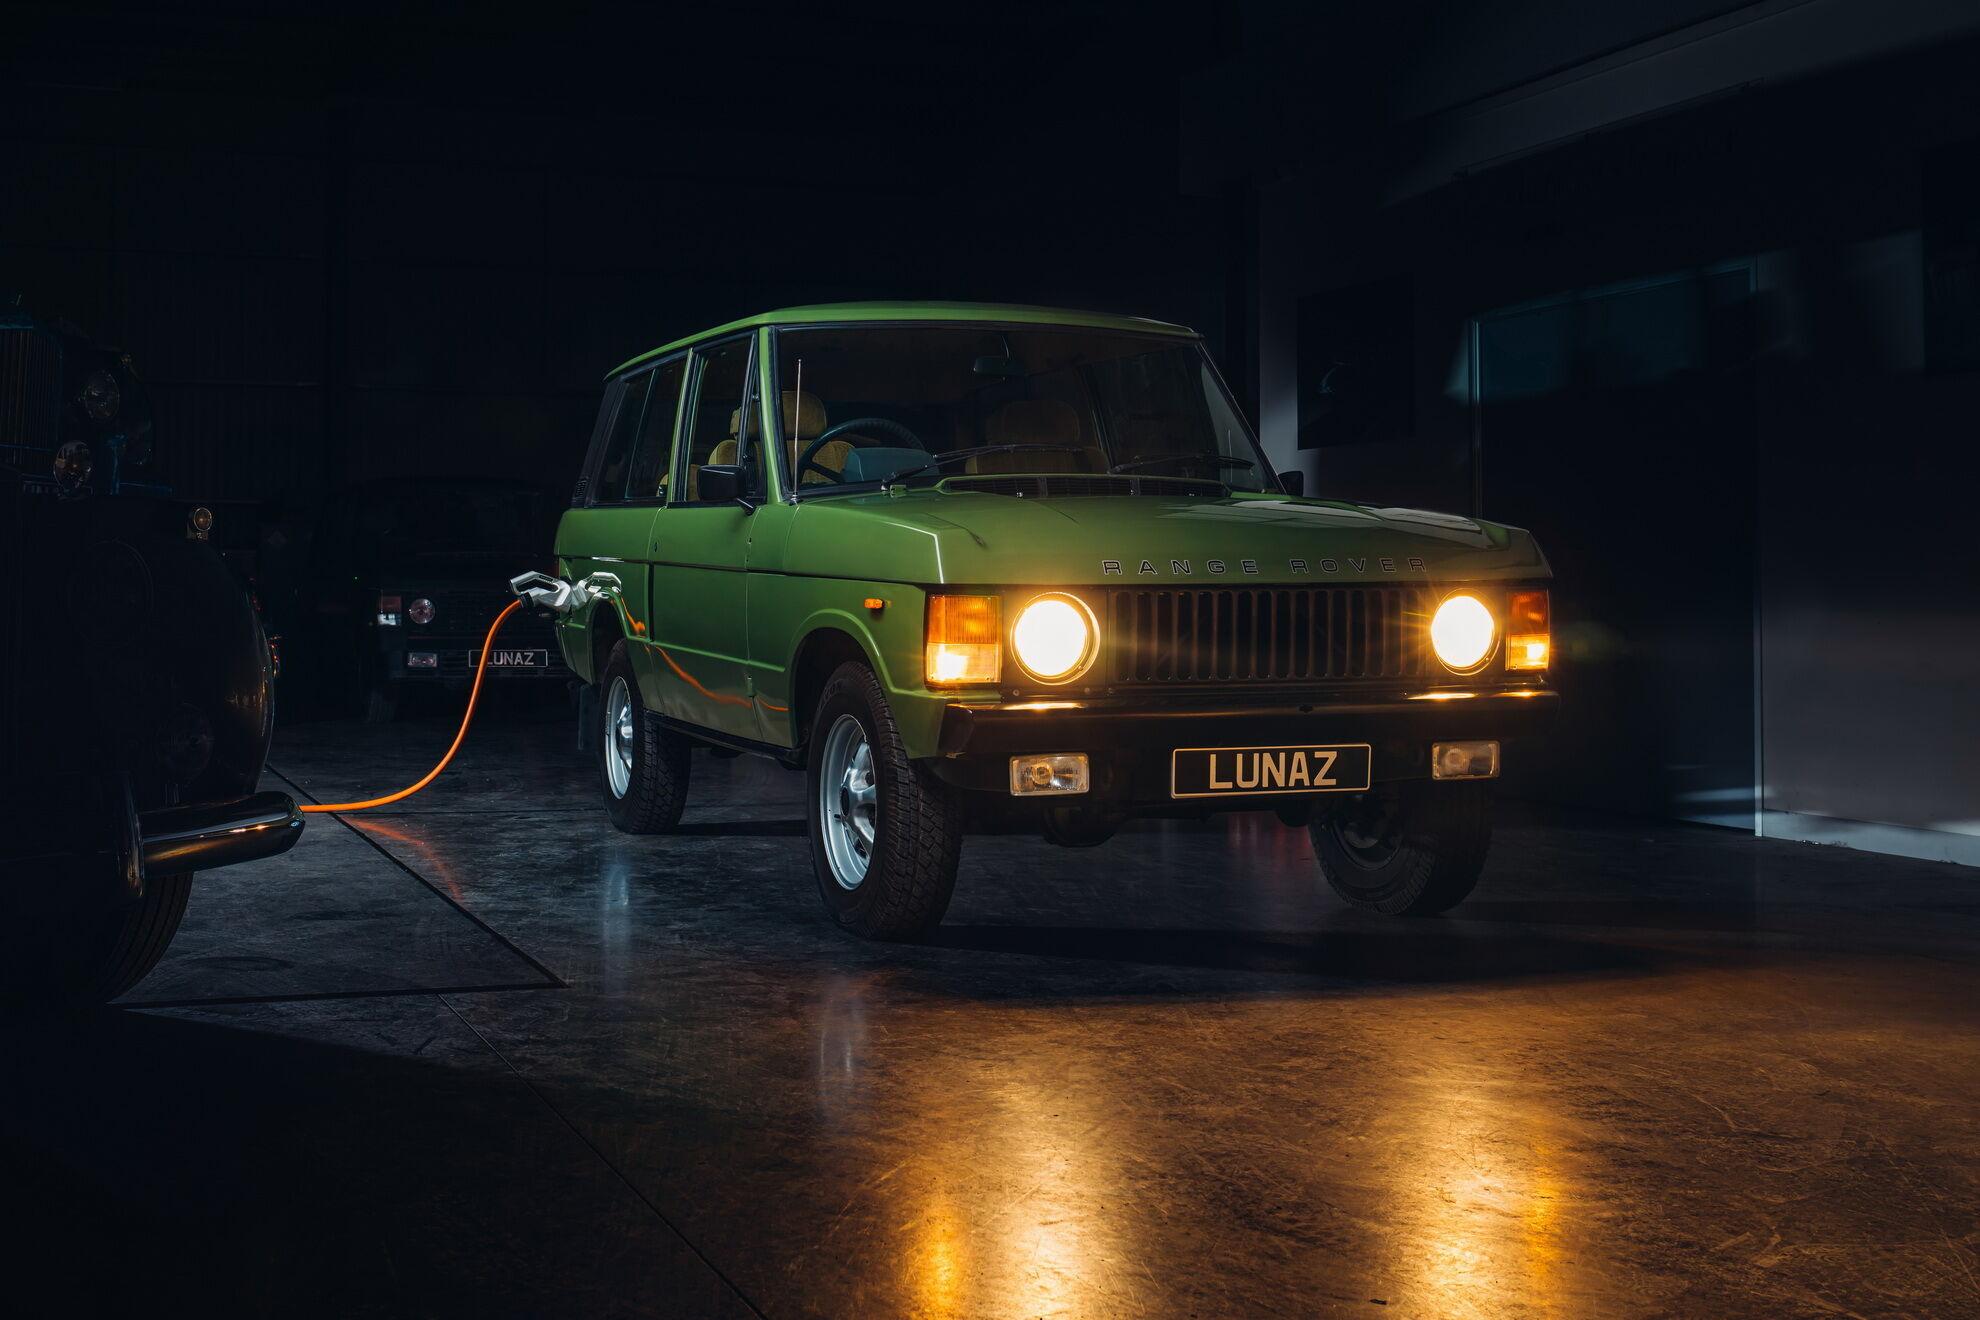 Электрический Range Rover будет предложен в двух спецификациях – Town и Country